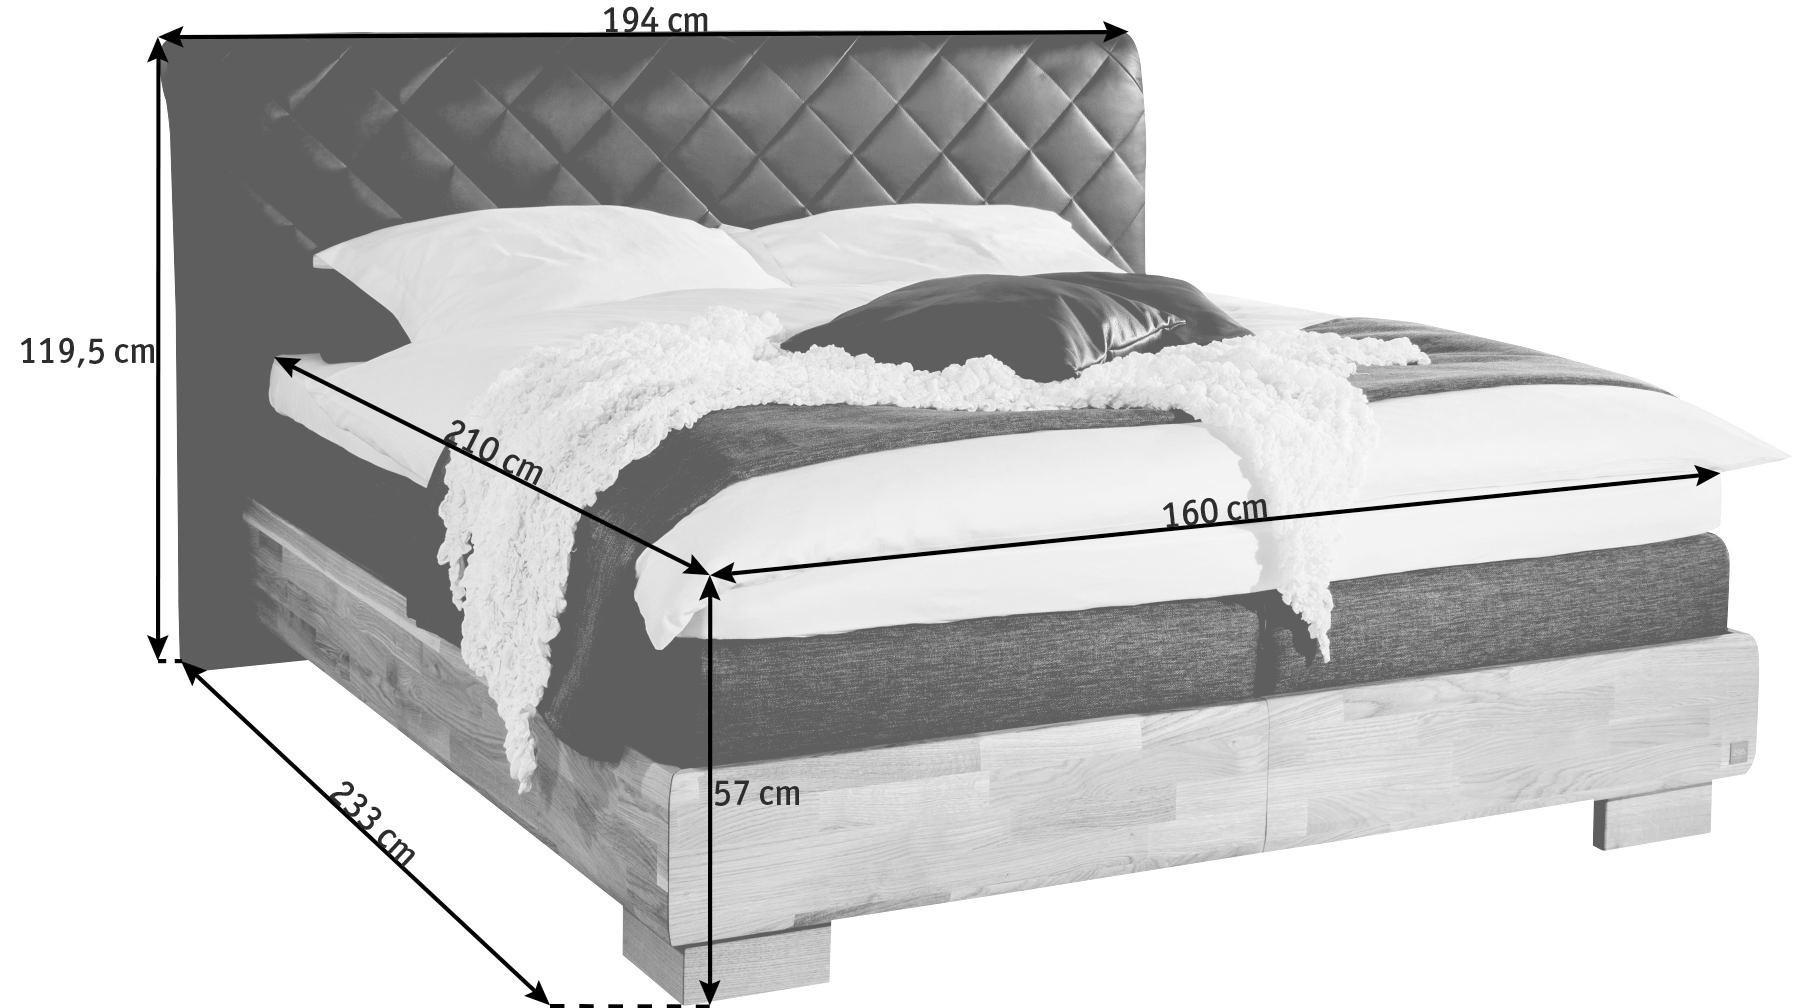 BOXSPRINGBETT 160/210 cm  INKL. Matratze, Topper - Eichefarben/Braun, KONVENTIONELL, Leder/Holz (160/210cm) - NOVEL